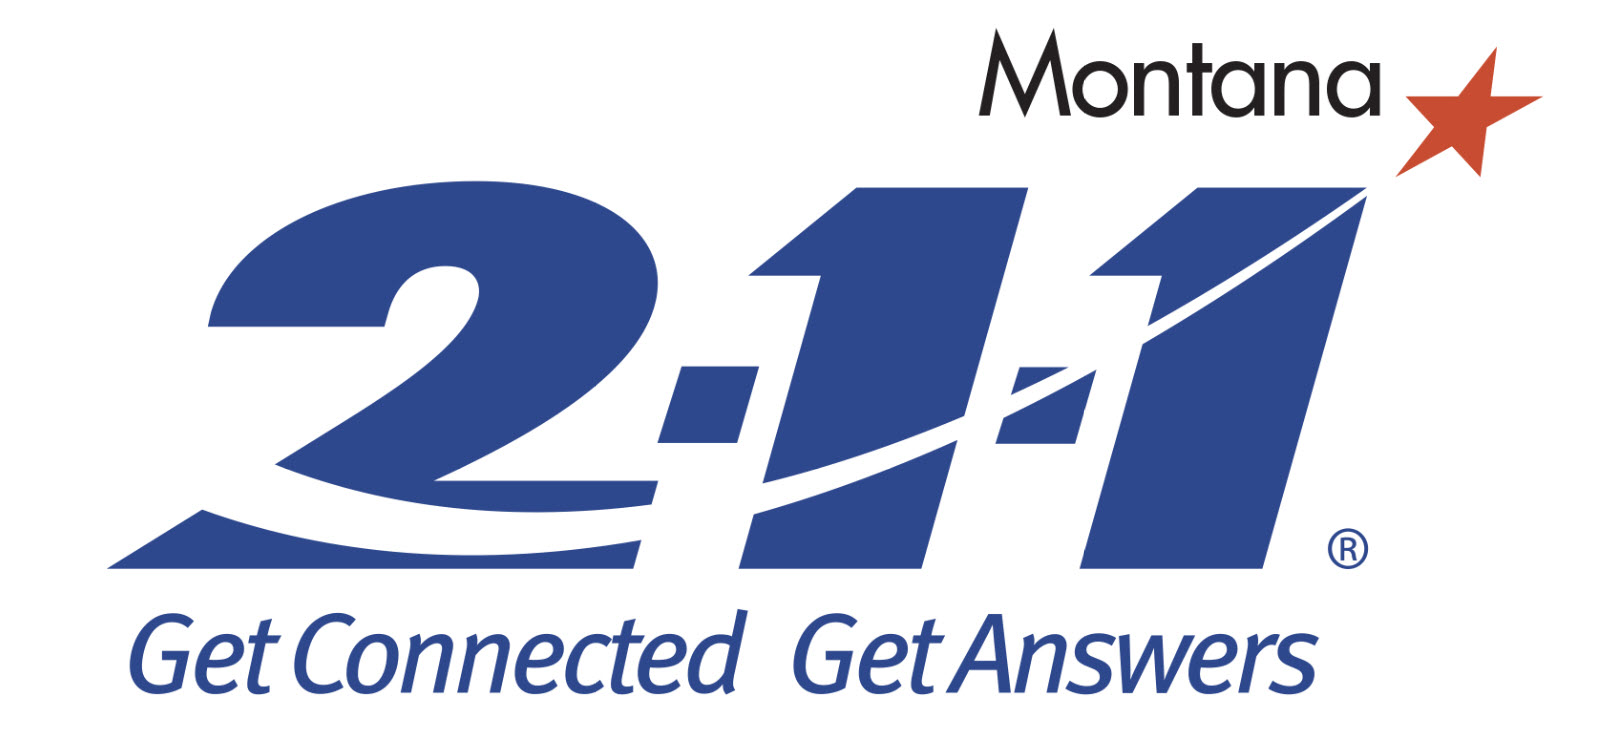 Montana 211